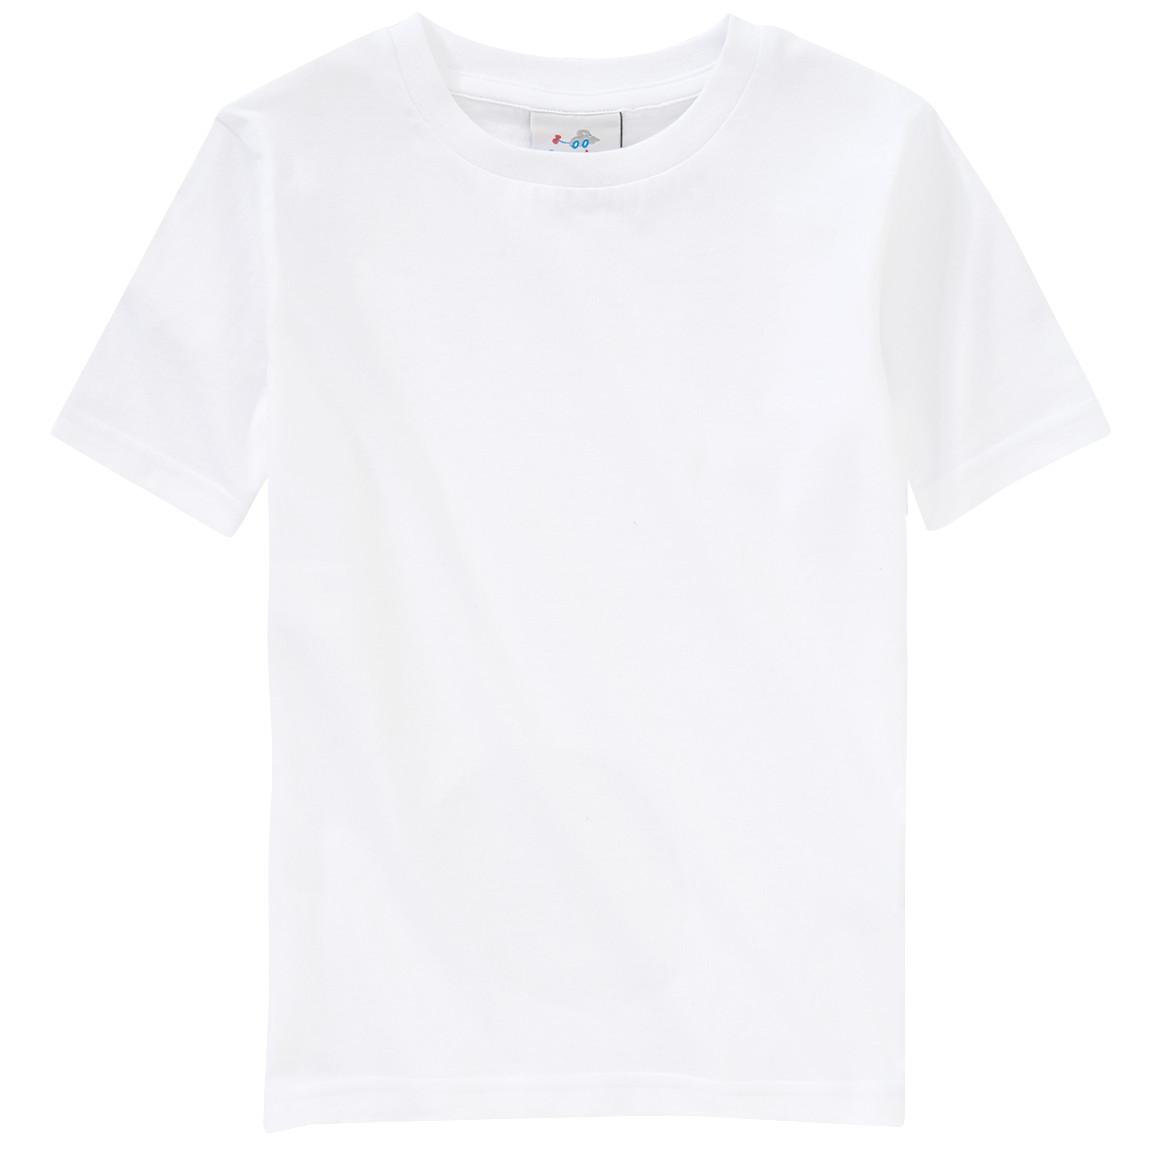 Jungen T-Shirt in Weiß